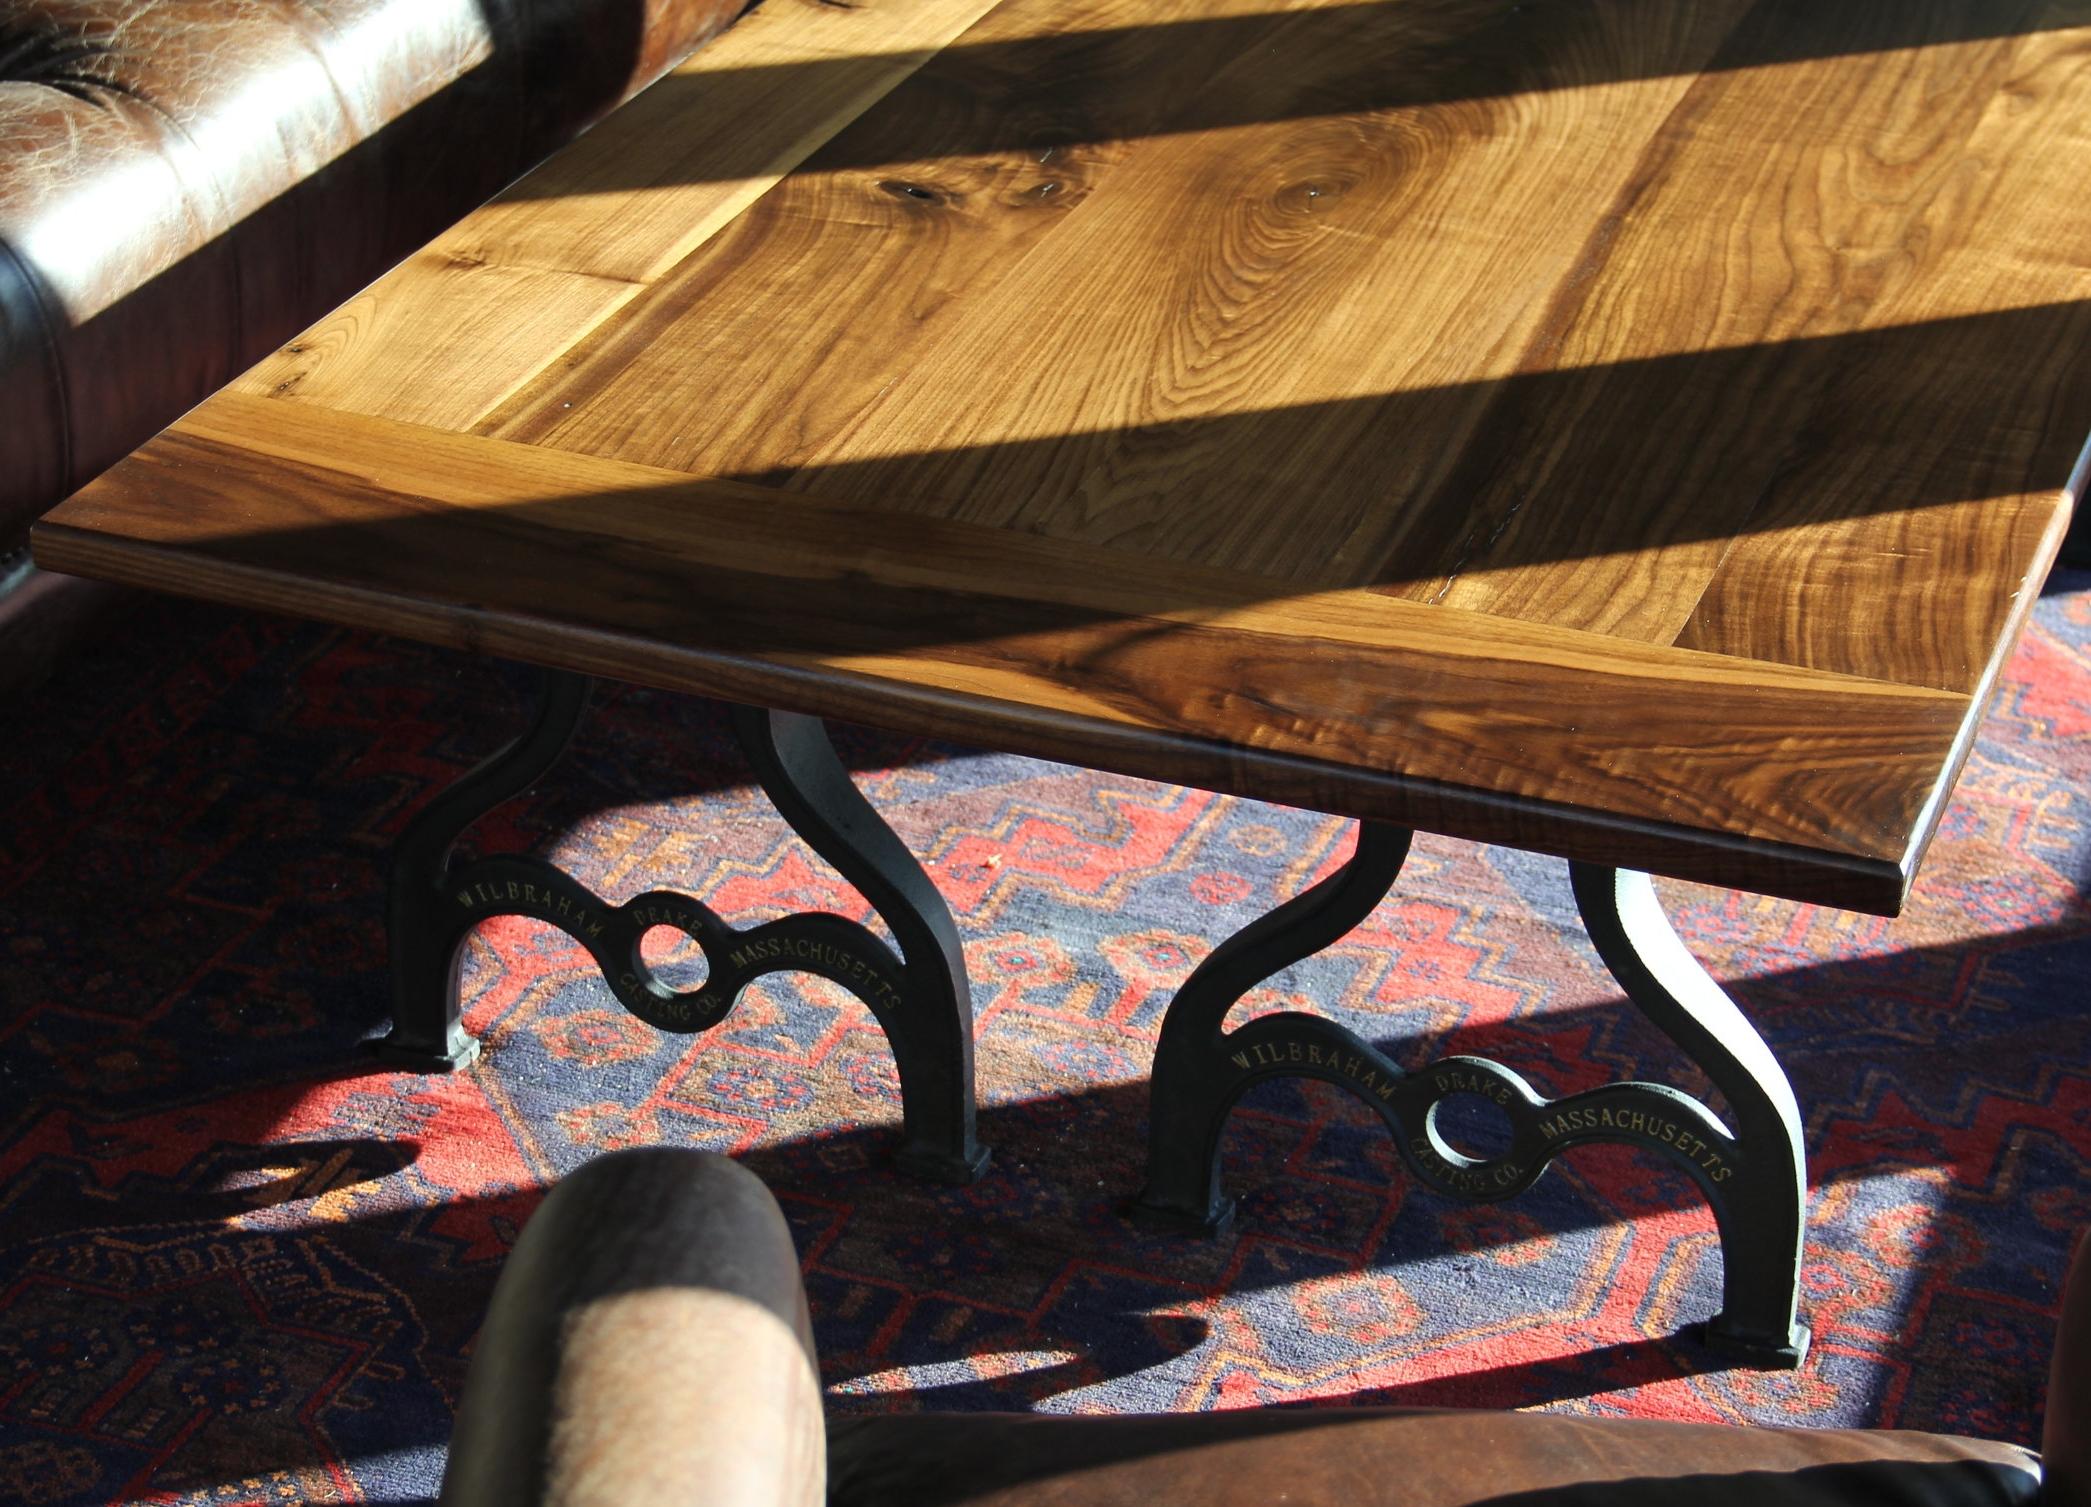 Walnut Farmhouse Coffee Table with Cast Iron legs.